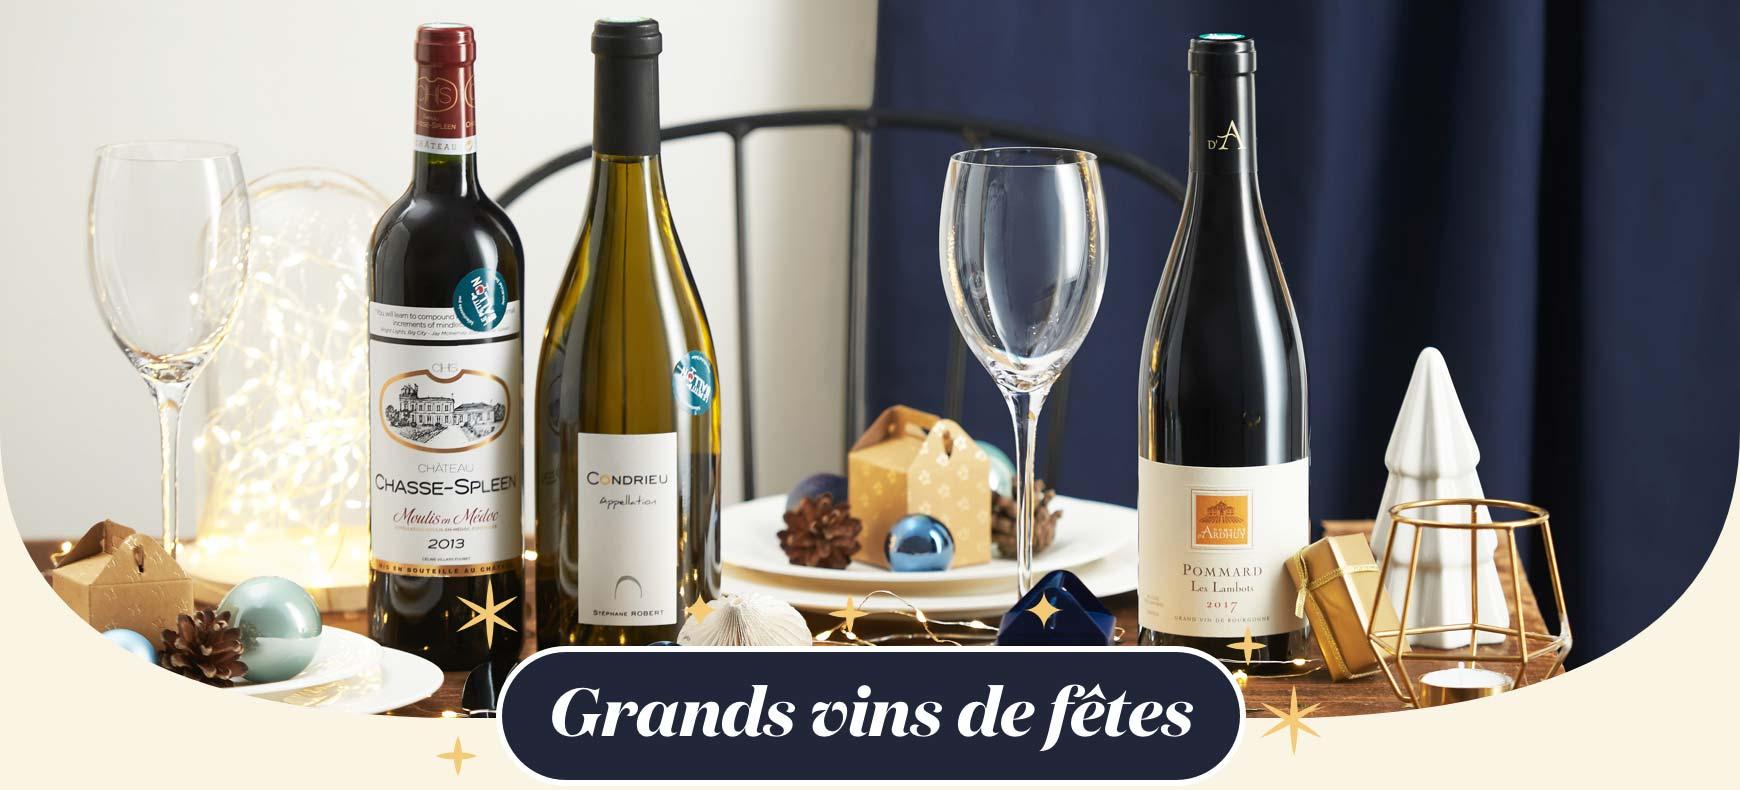 Grands vins de fête